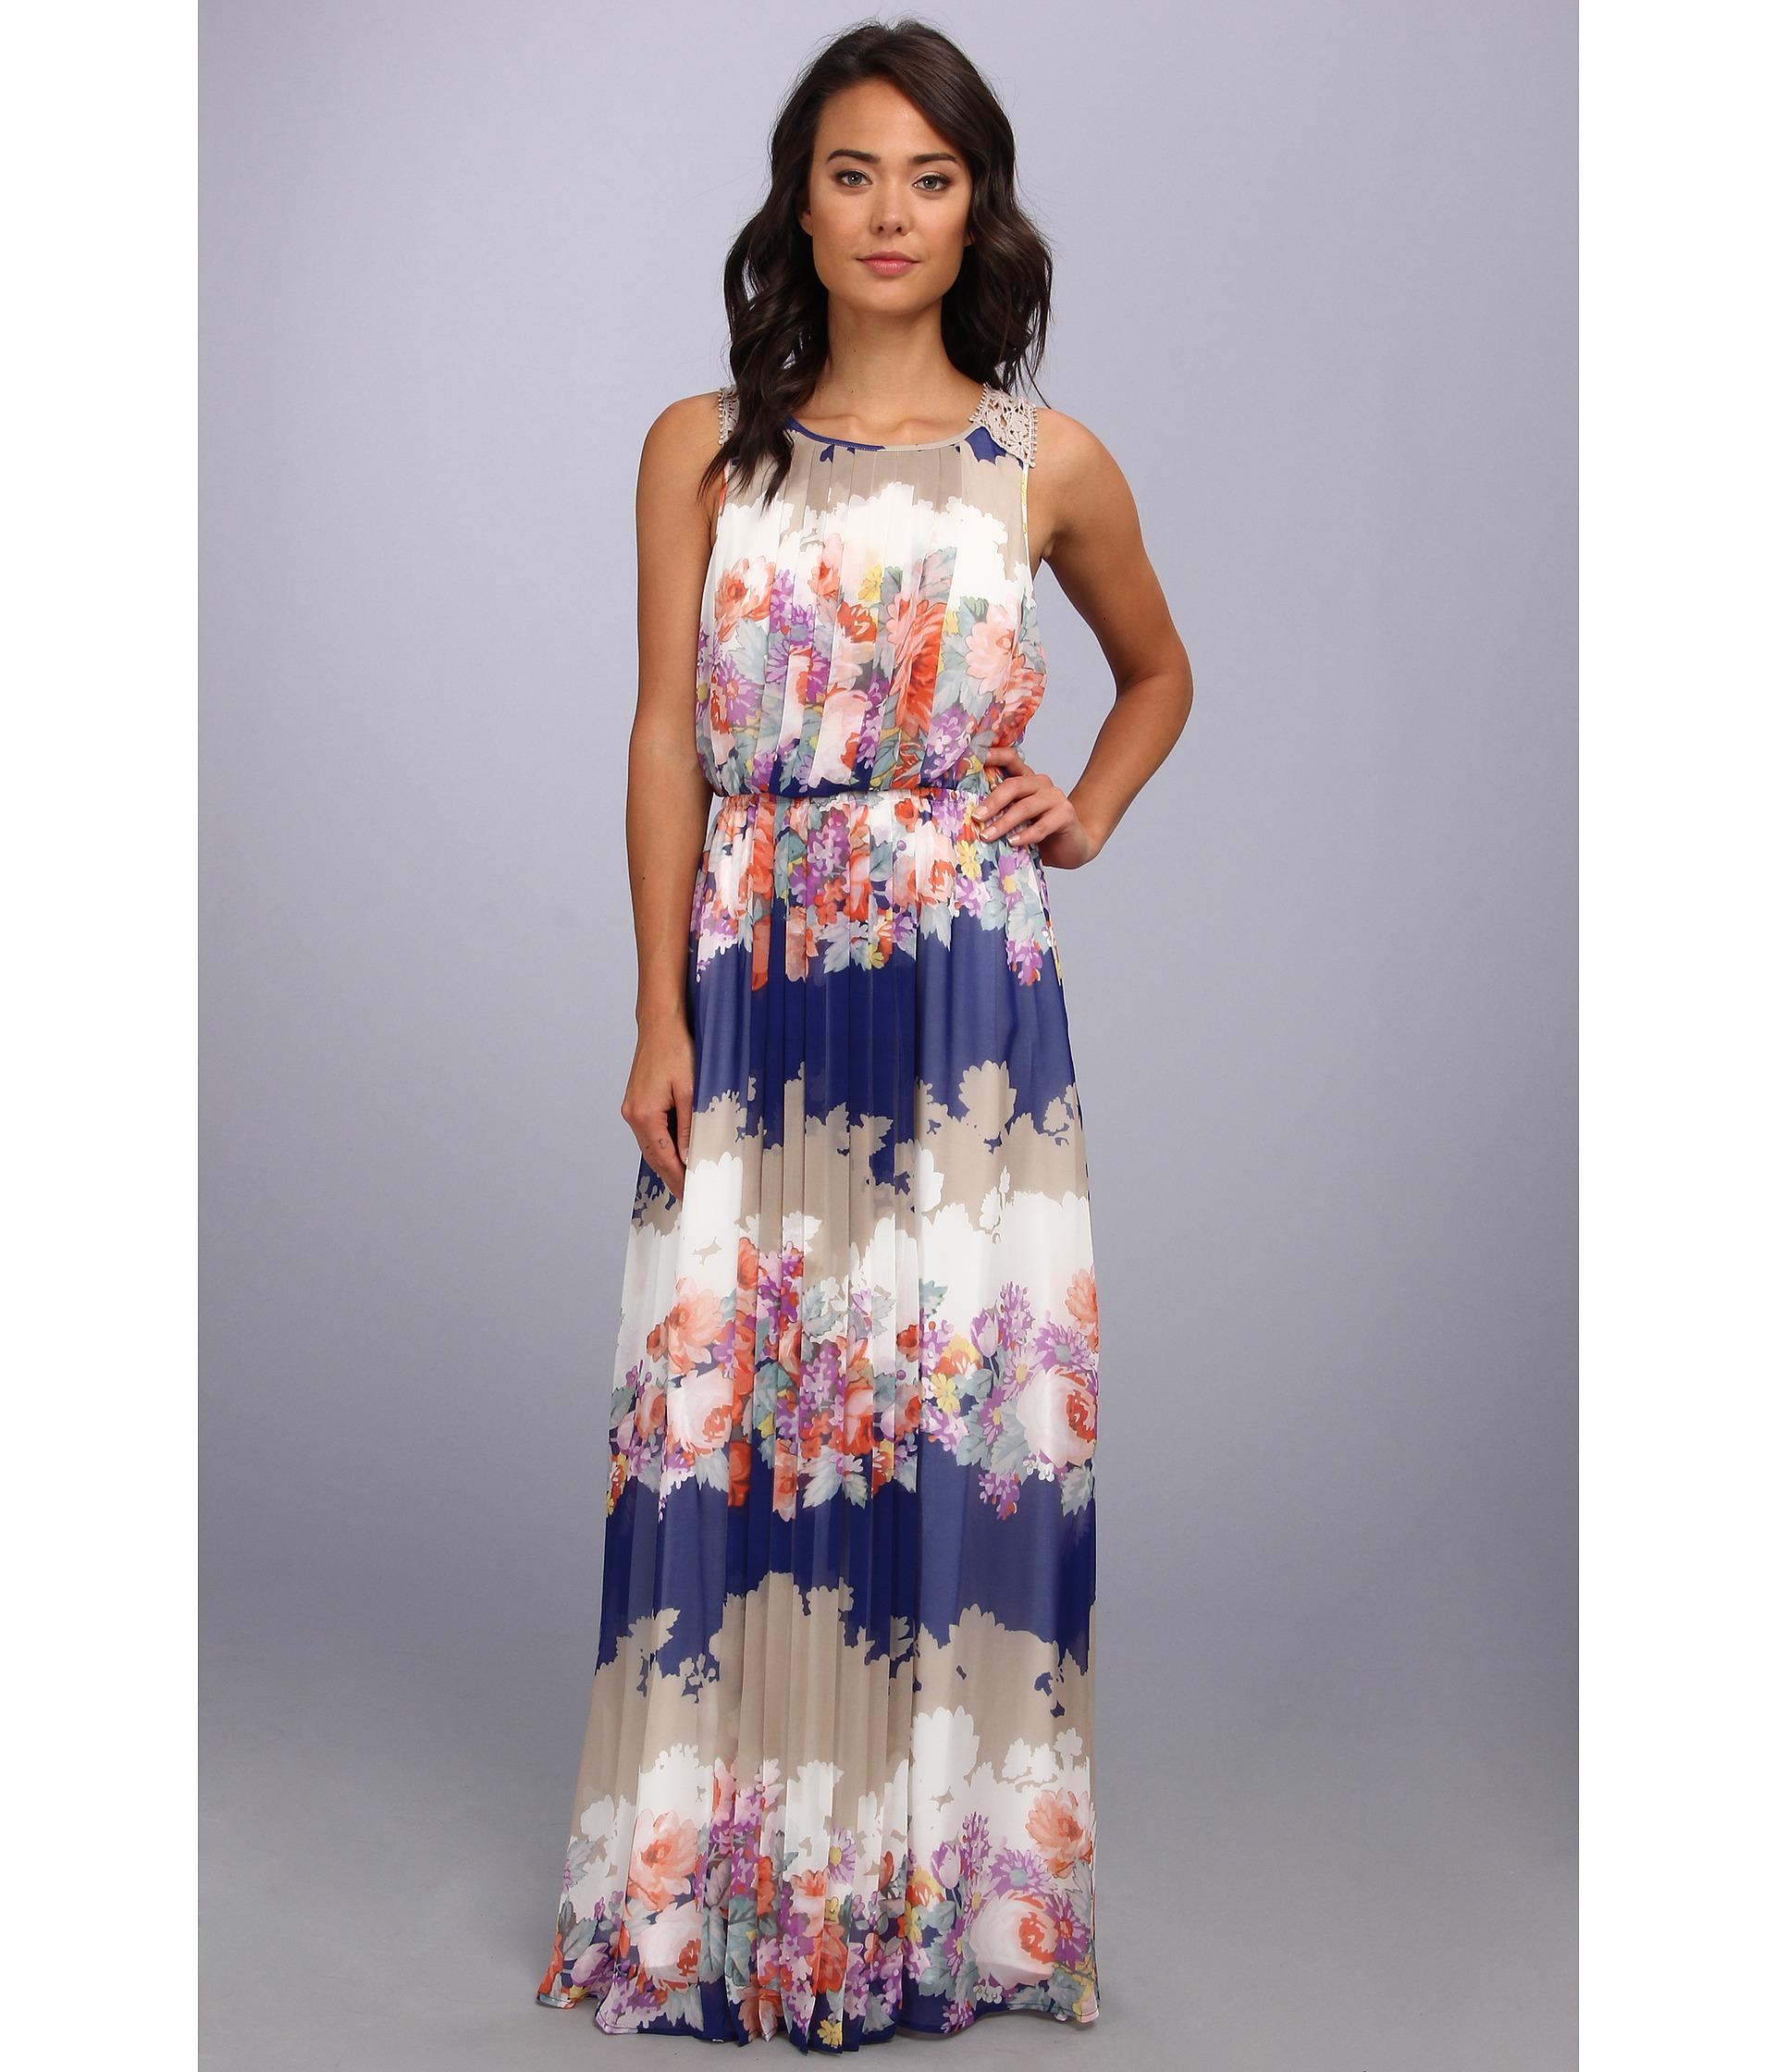 Jessica Simpson Sleeveless Blouson Maxi Dress With Cb Scallop Trim And Skirt Ruffle